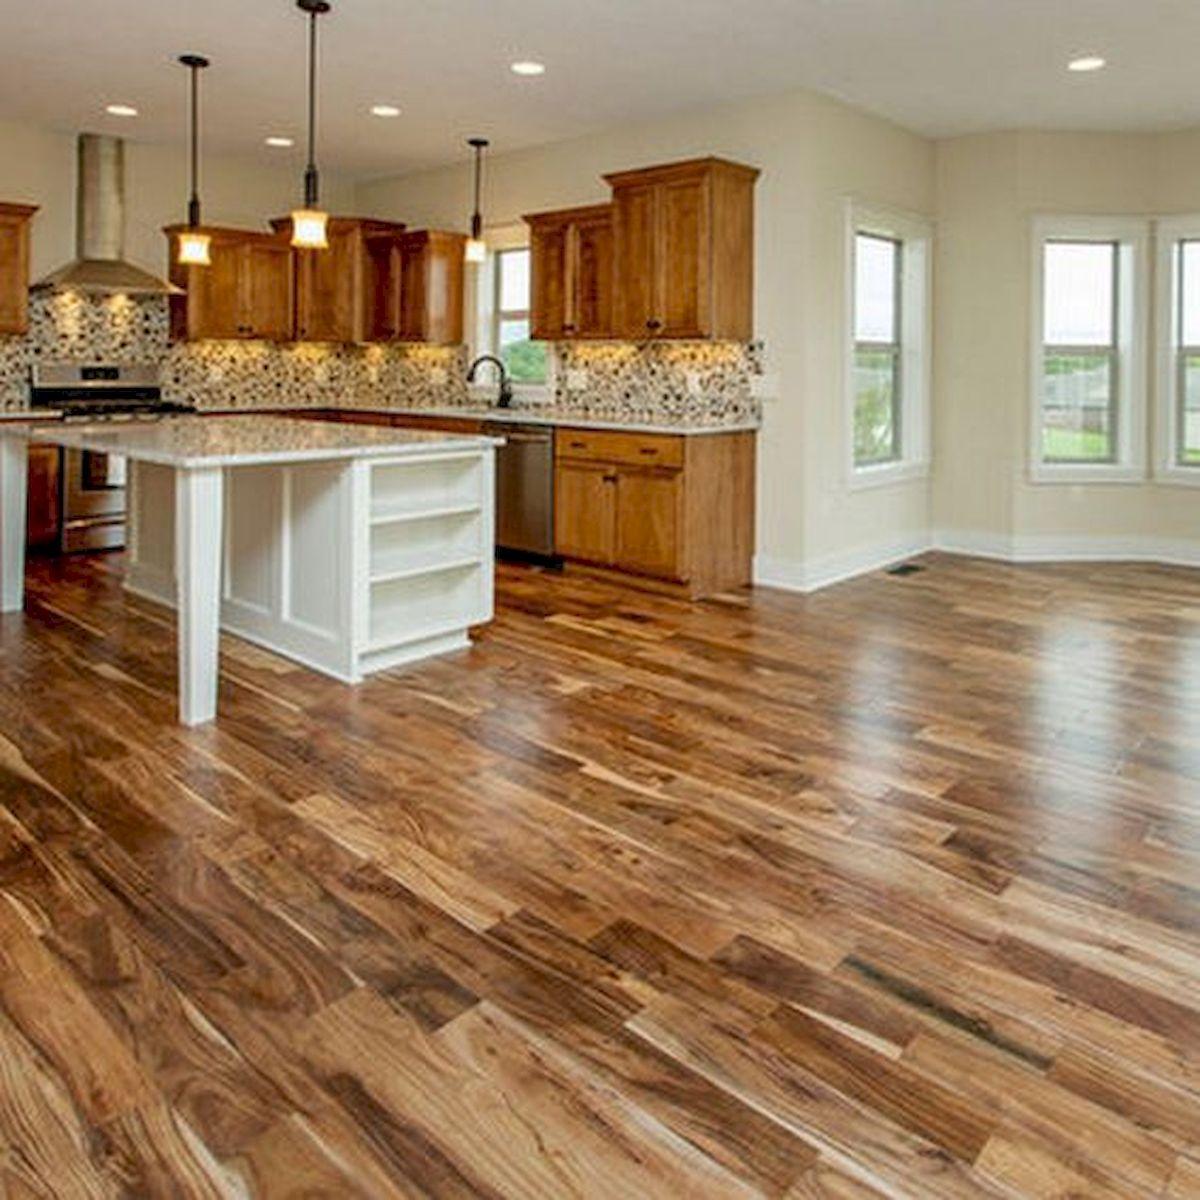 80 Gorgeous Hardwood Floor Ideas for Interior Home (44)